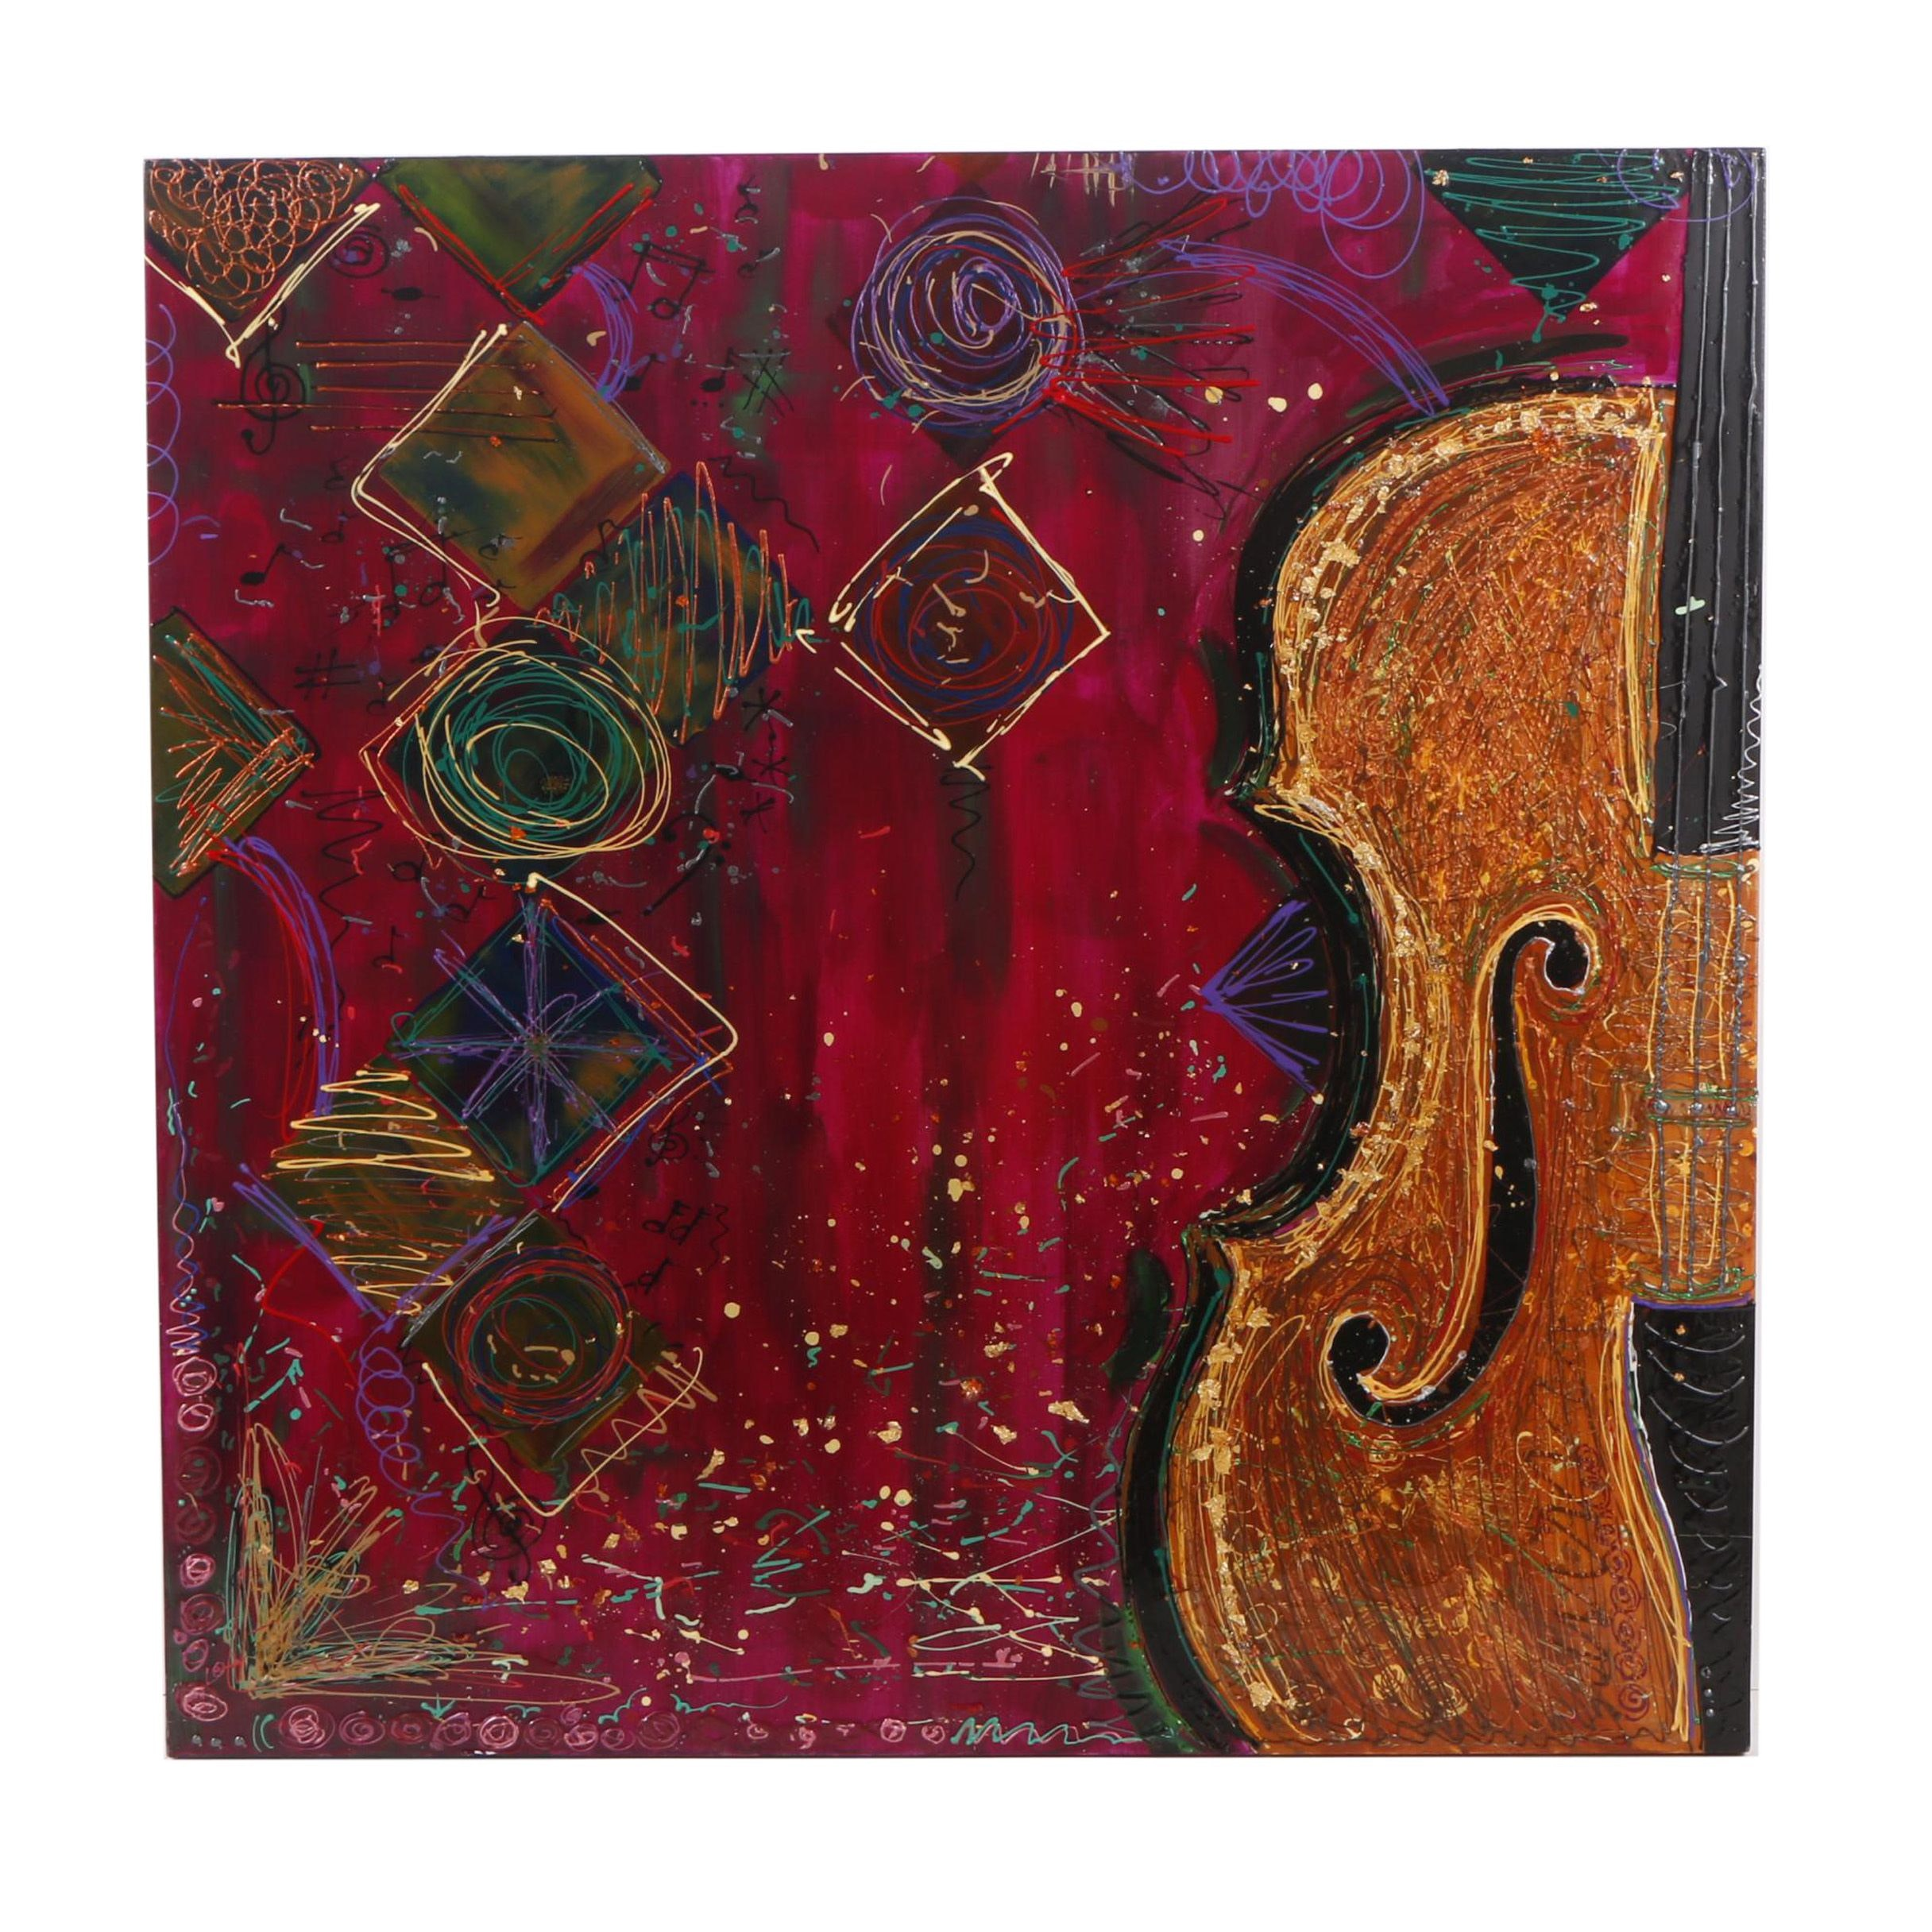 Decorative Mixed Media Painting of Violin